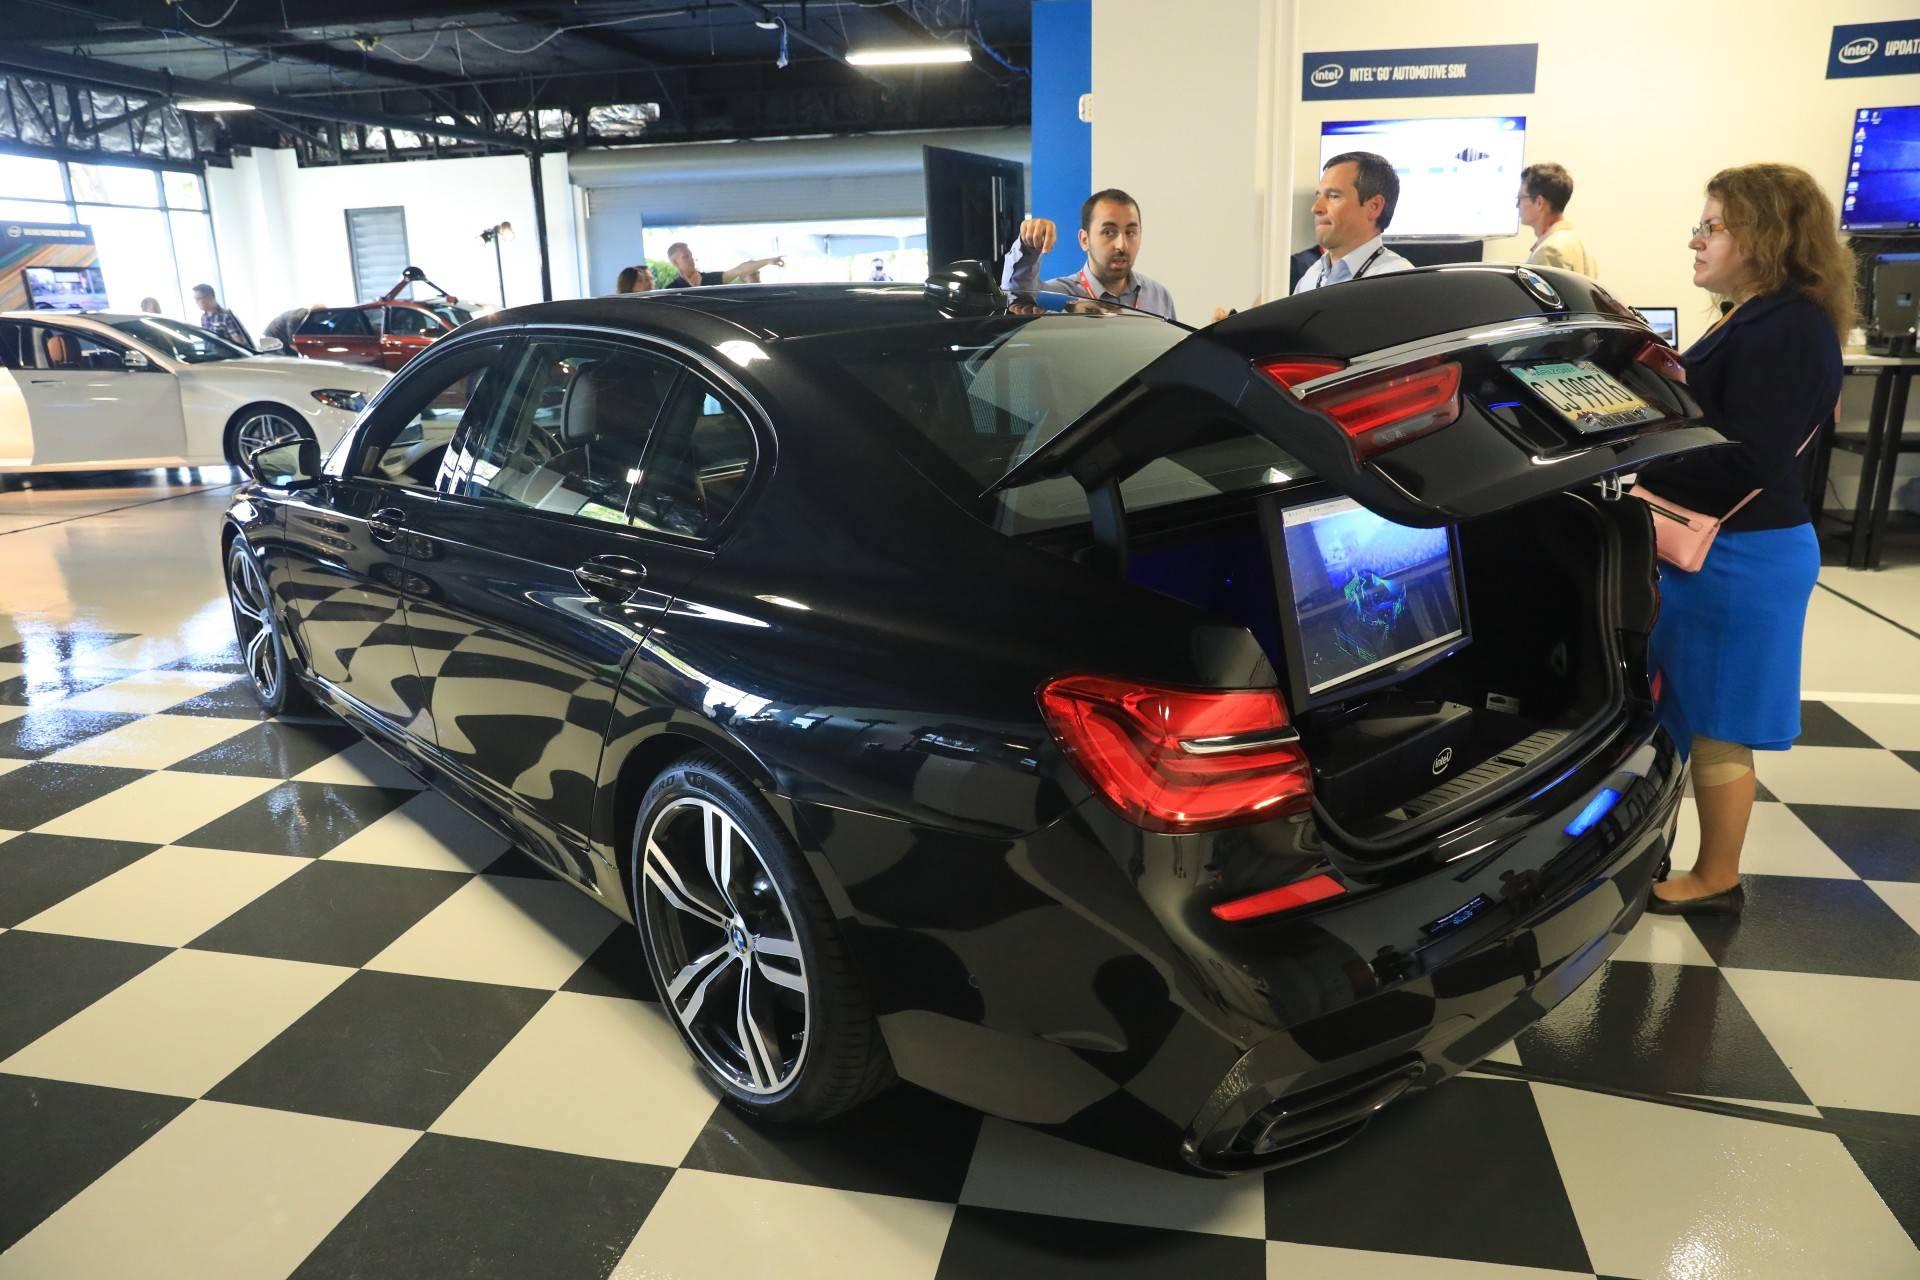 Intel-Autonomos-driving-2-1-squashed